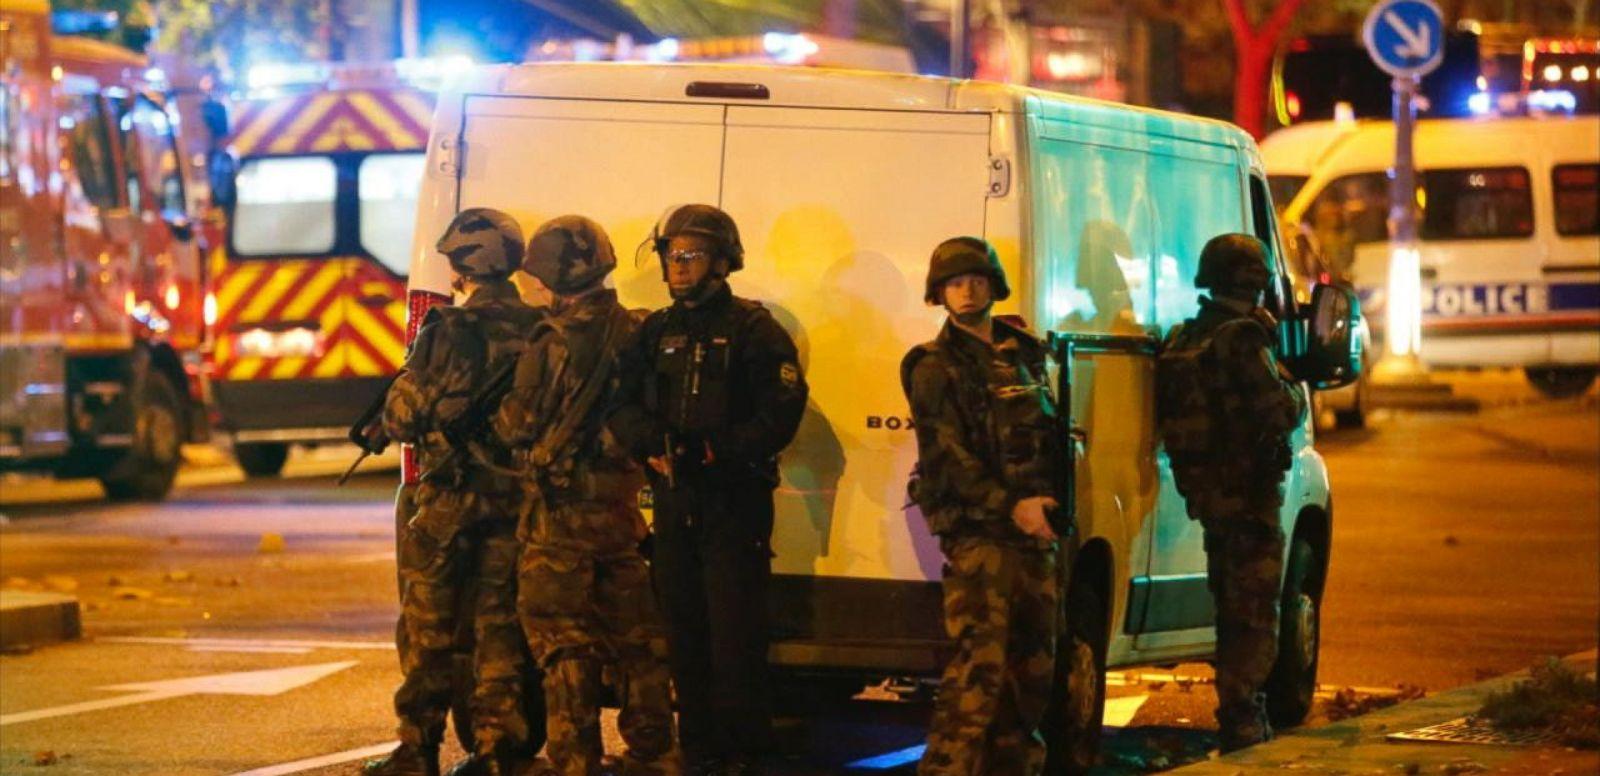 VIDEO: How the Paris Terror Attacks Unfolded